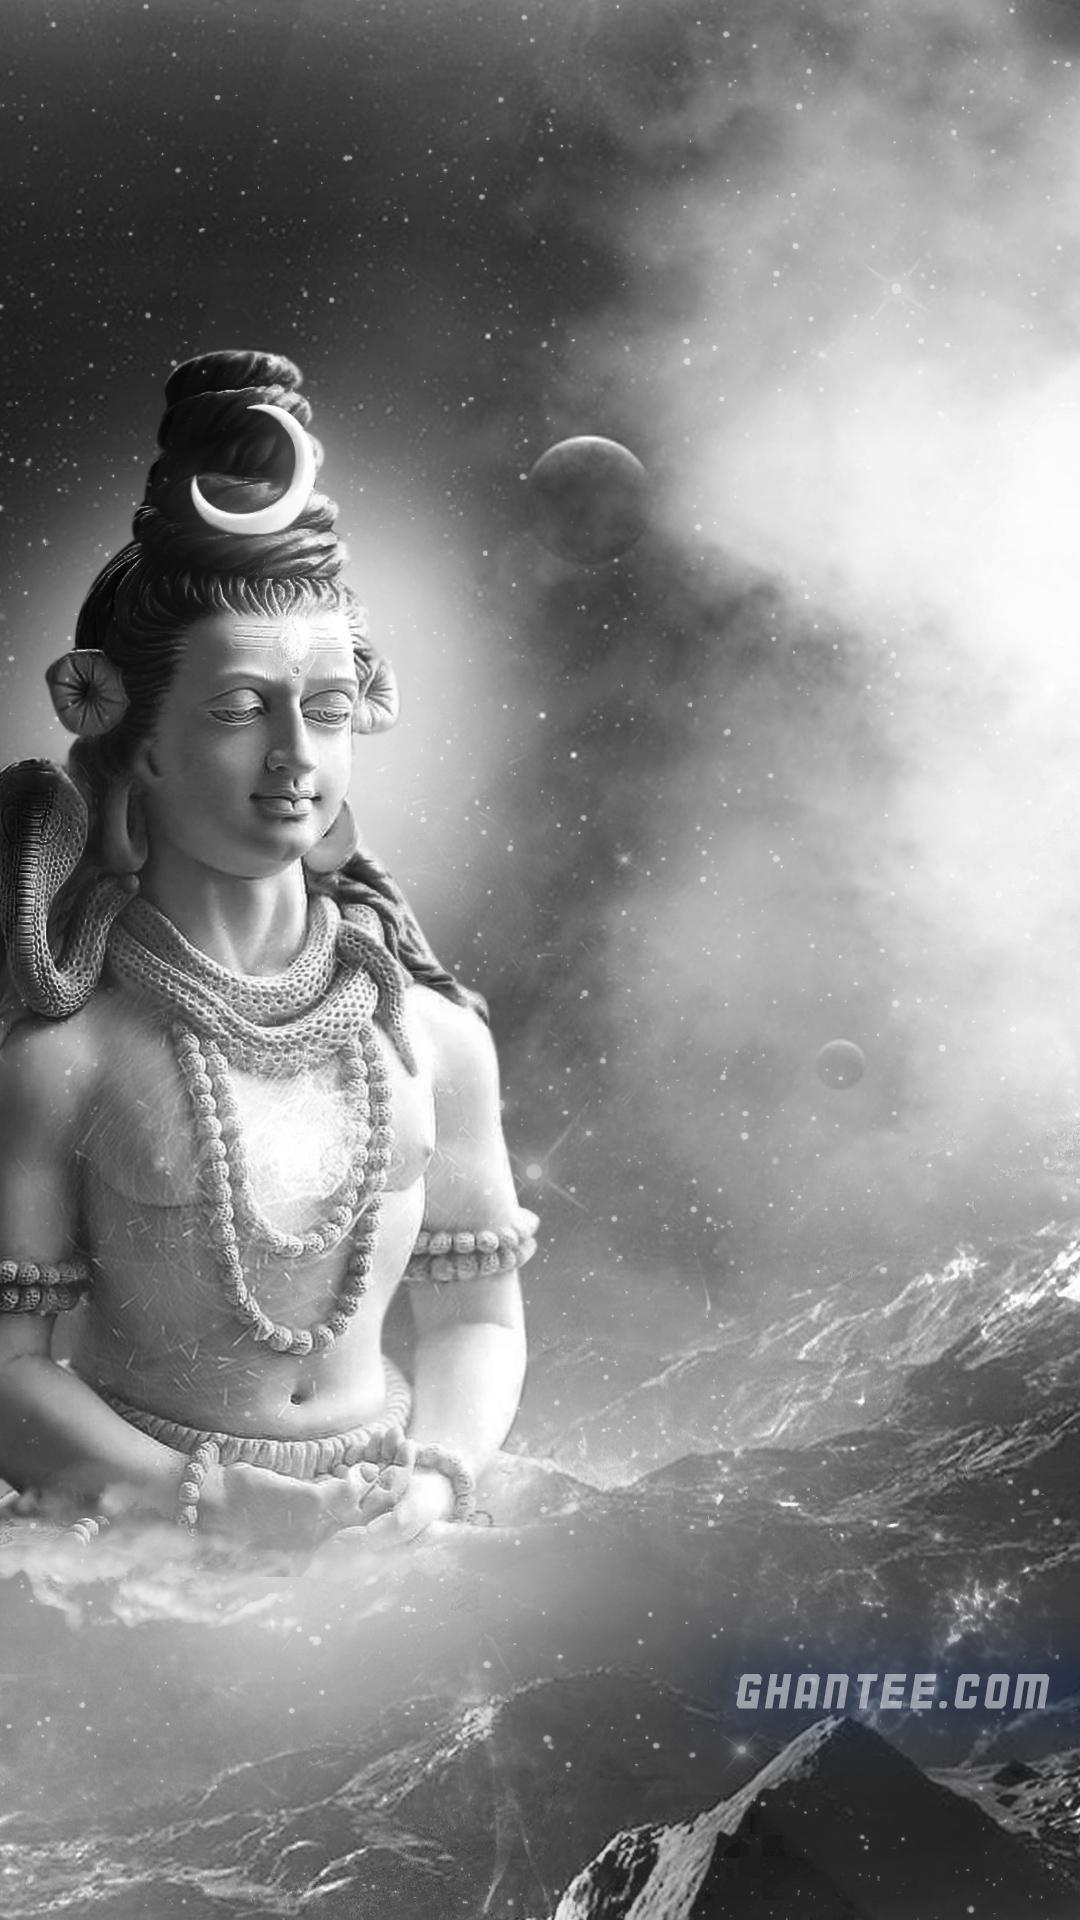 Shiv hindu god wallpaper hd for mobile